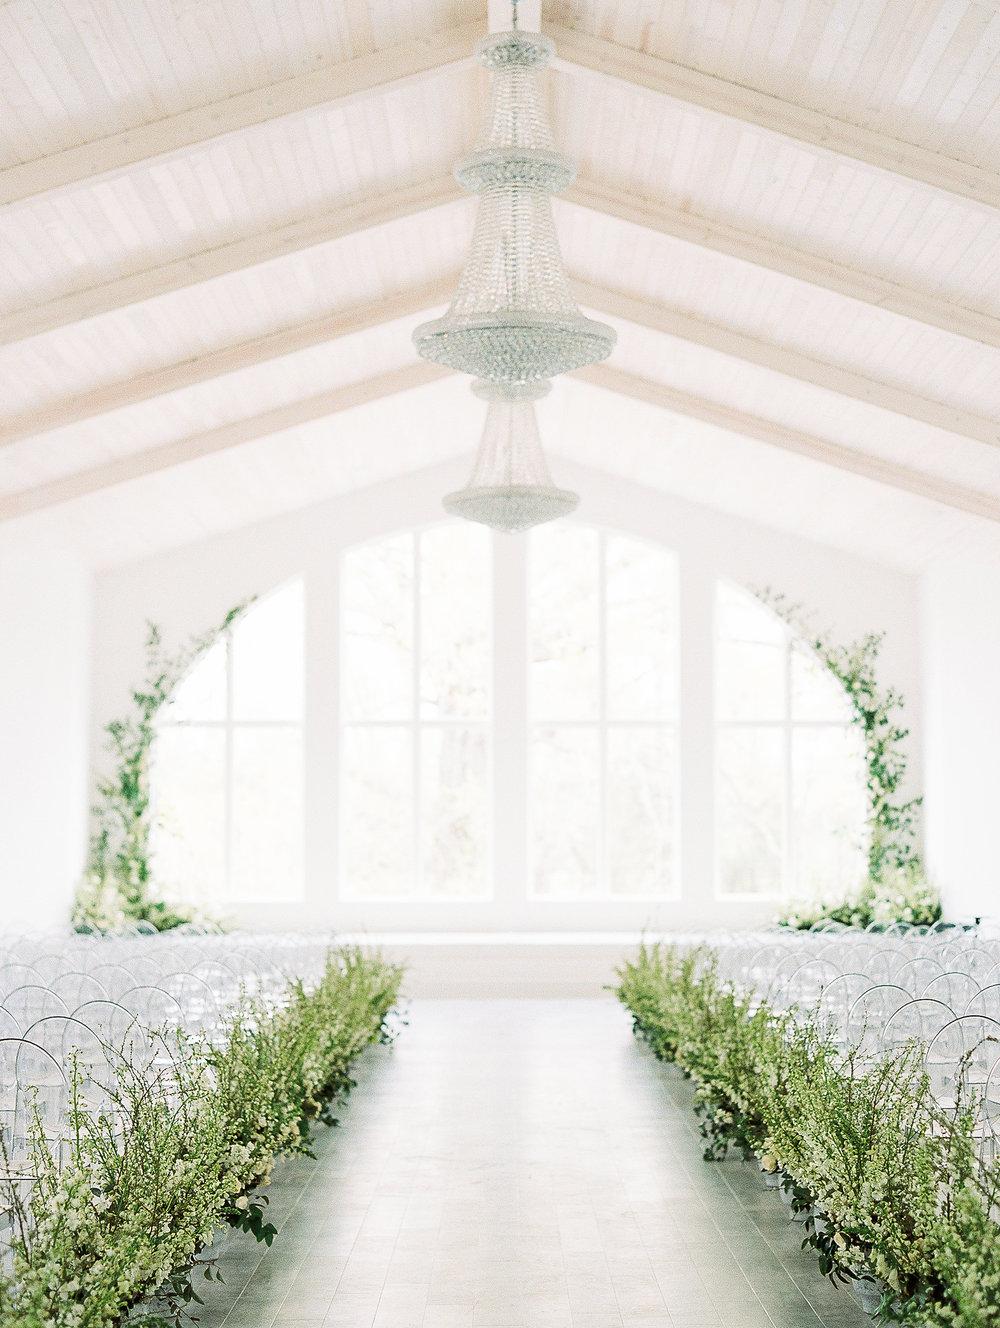 zimmerman-events-wedding-ceremony-floral.jpg